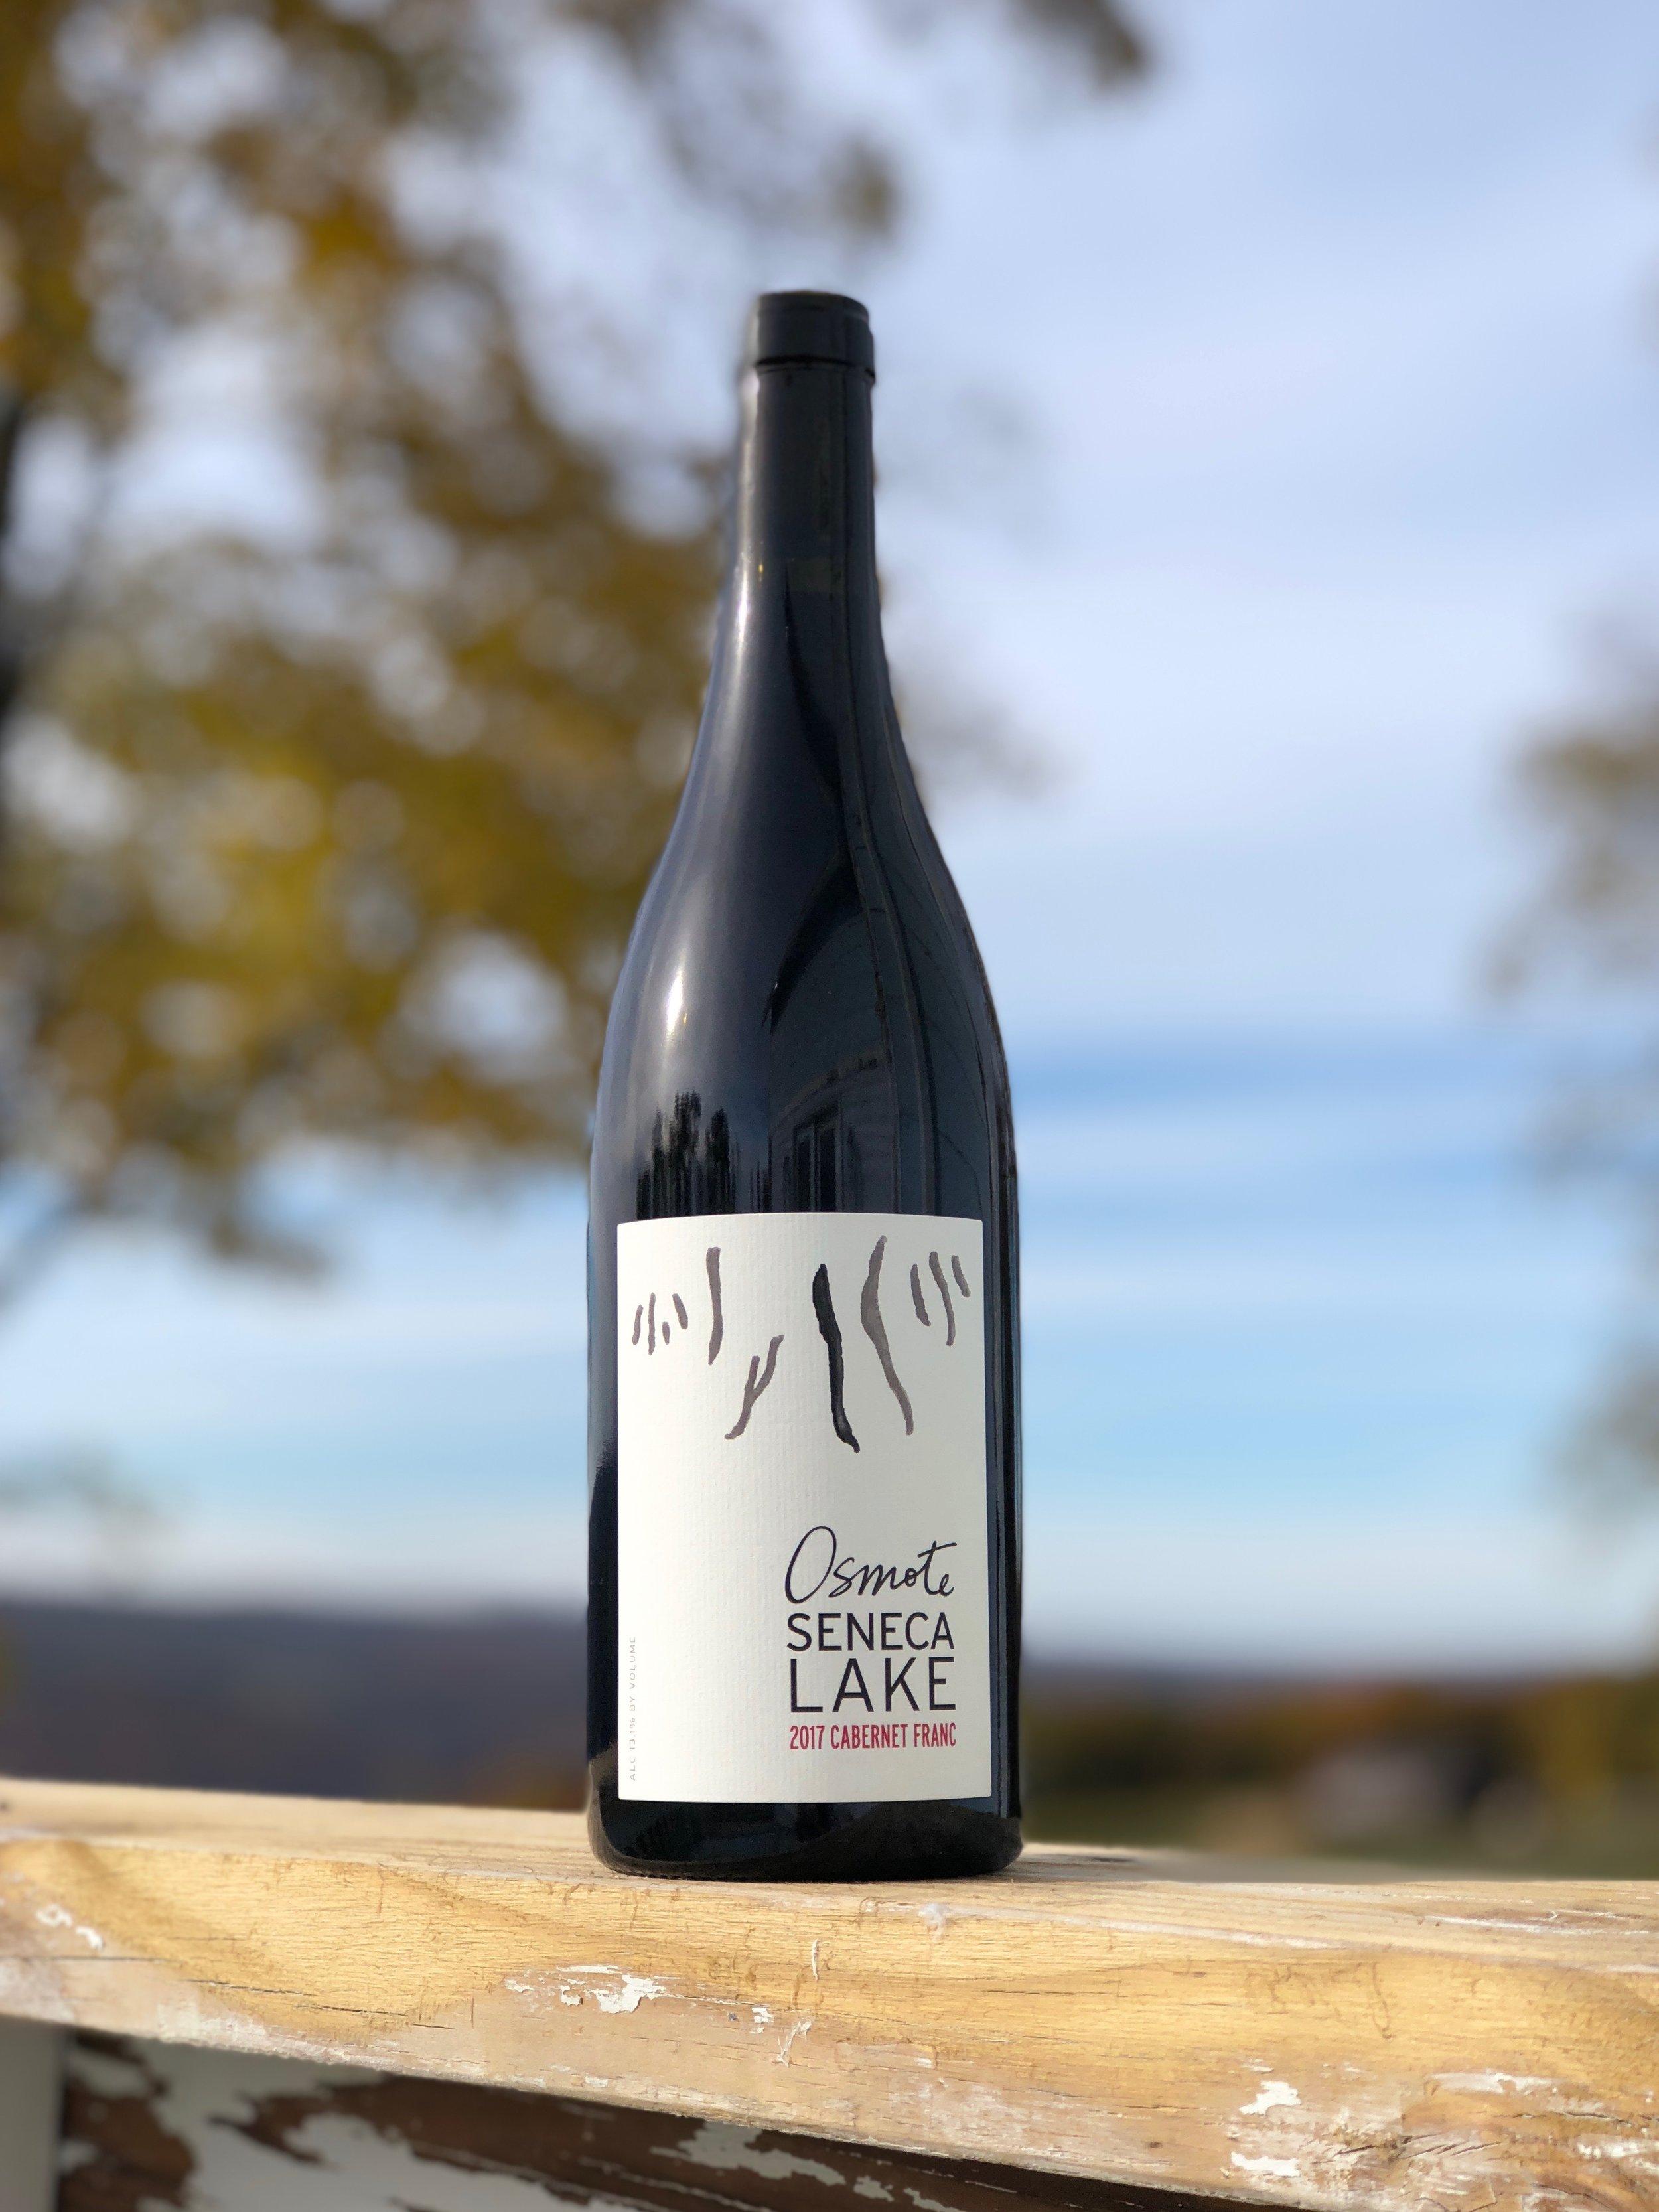 2017 seneca lake cabernet franc - Playful tannins on a sunny, autumn afternoon…